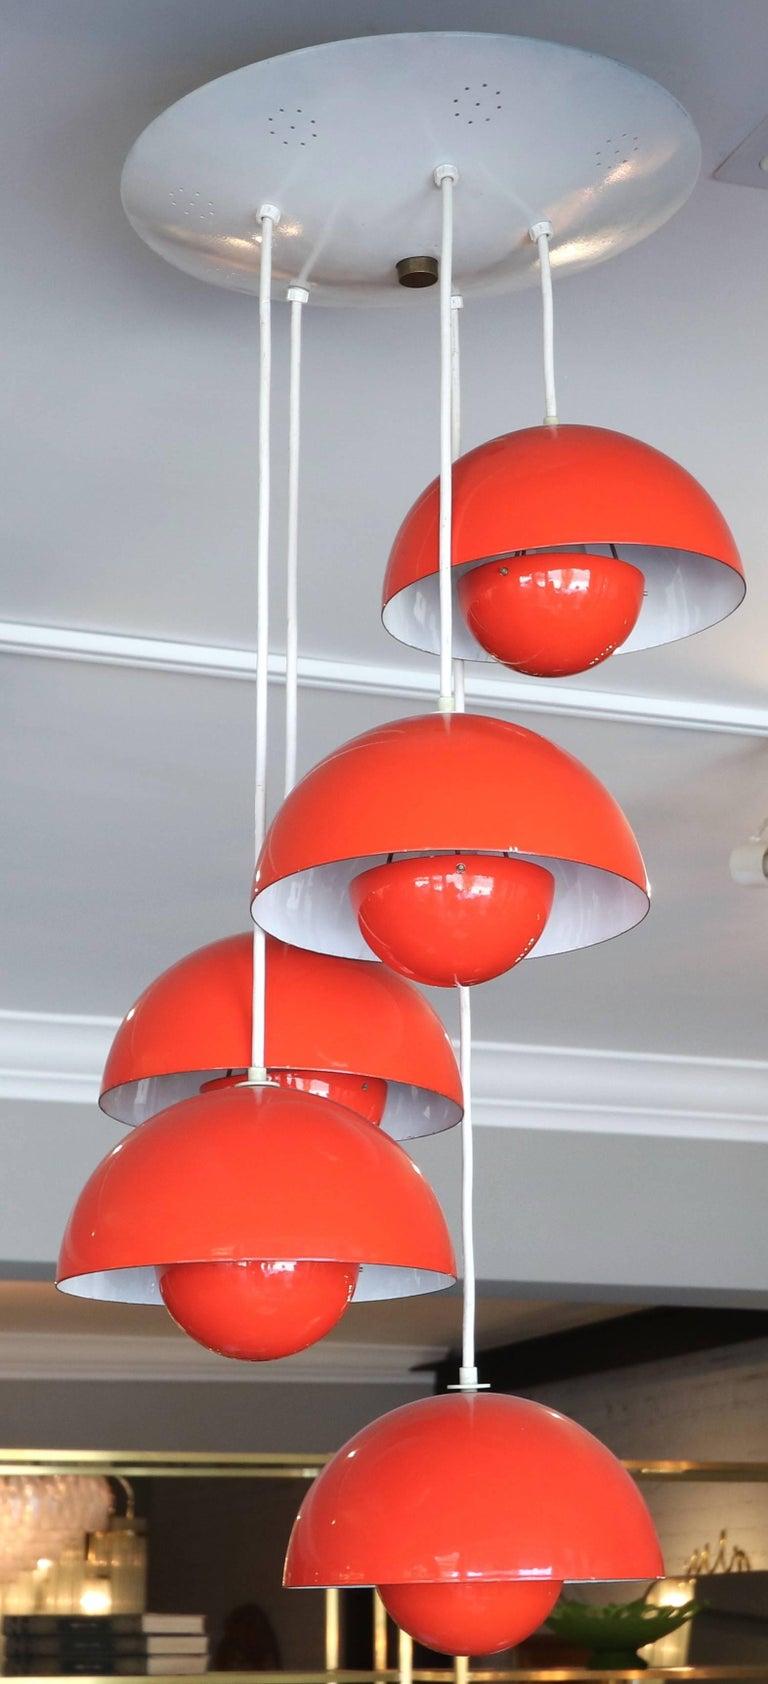 1970s big flower pot chandelier in red metal with five lights by Verner Panton.